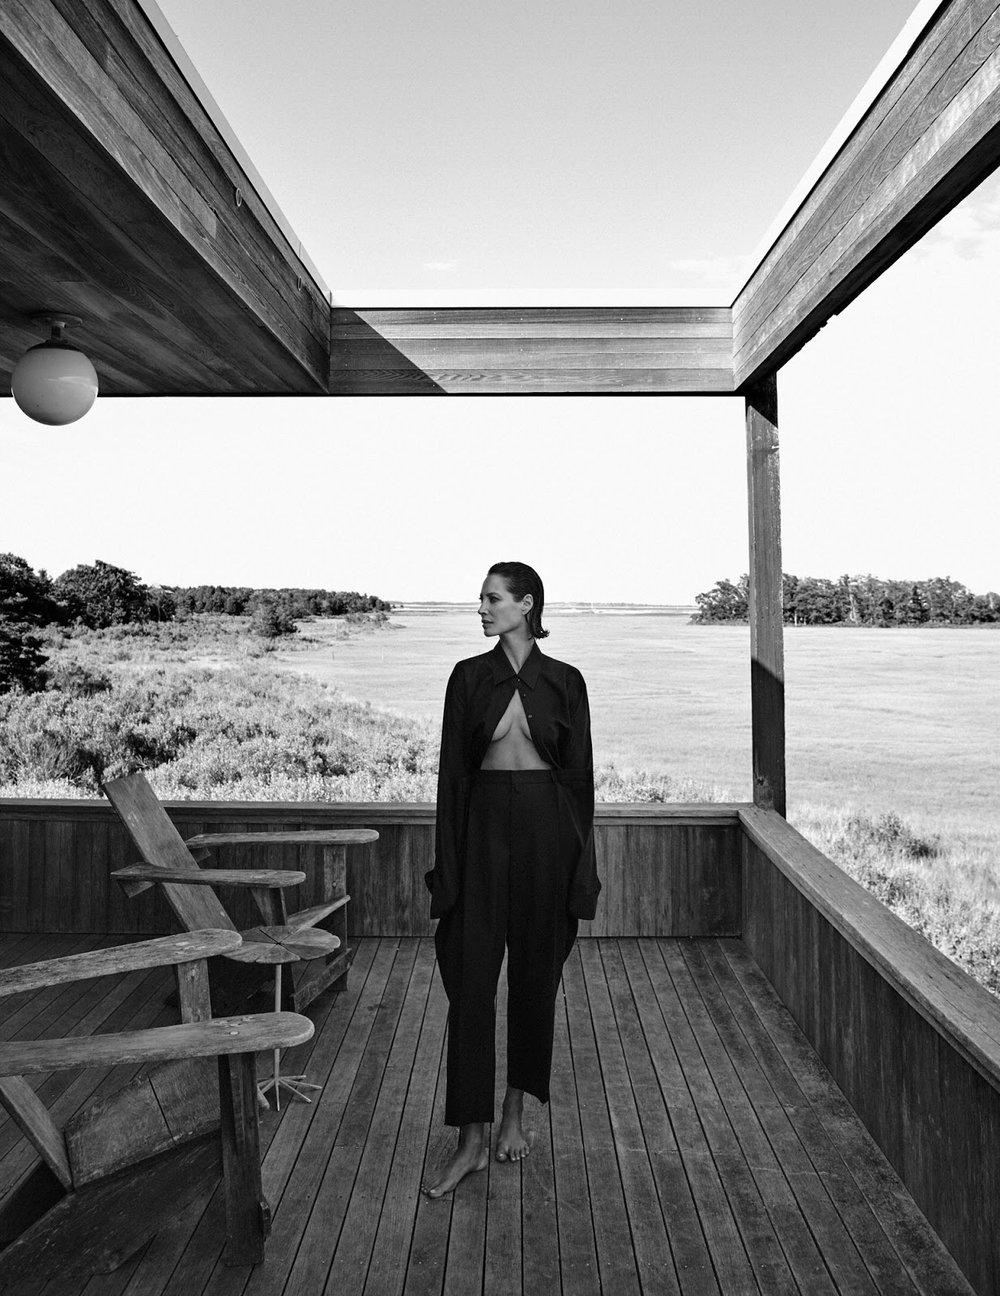 Christy Turlington by Chris Colls for Vogue Poland September 2018 (17).jpg